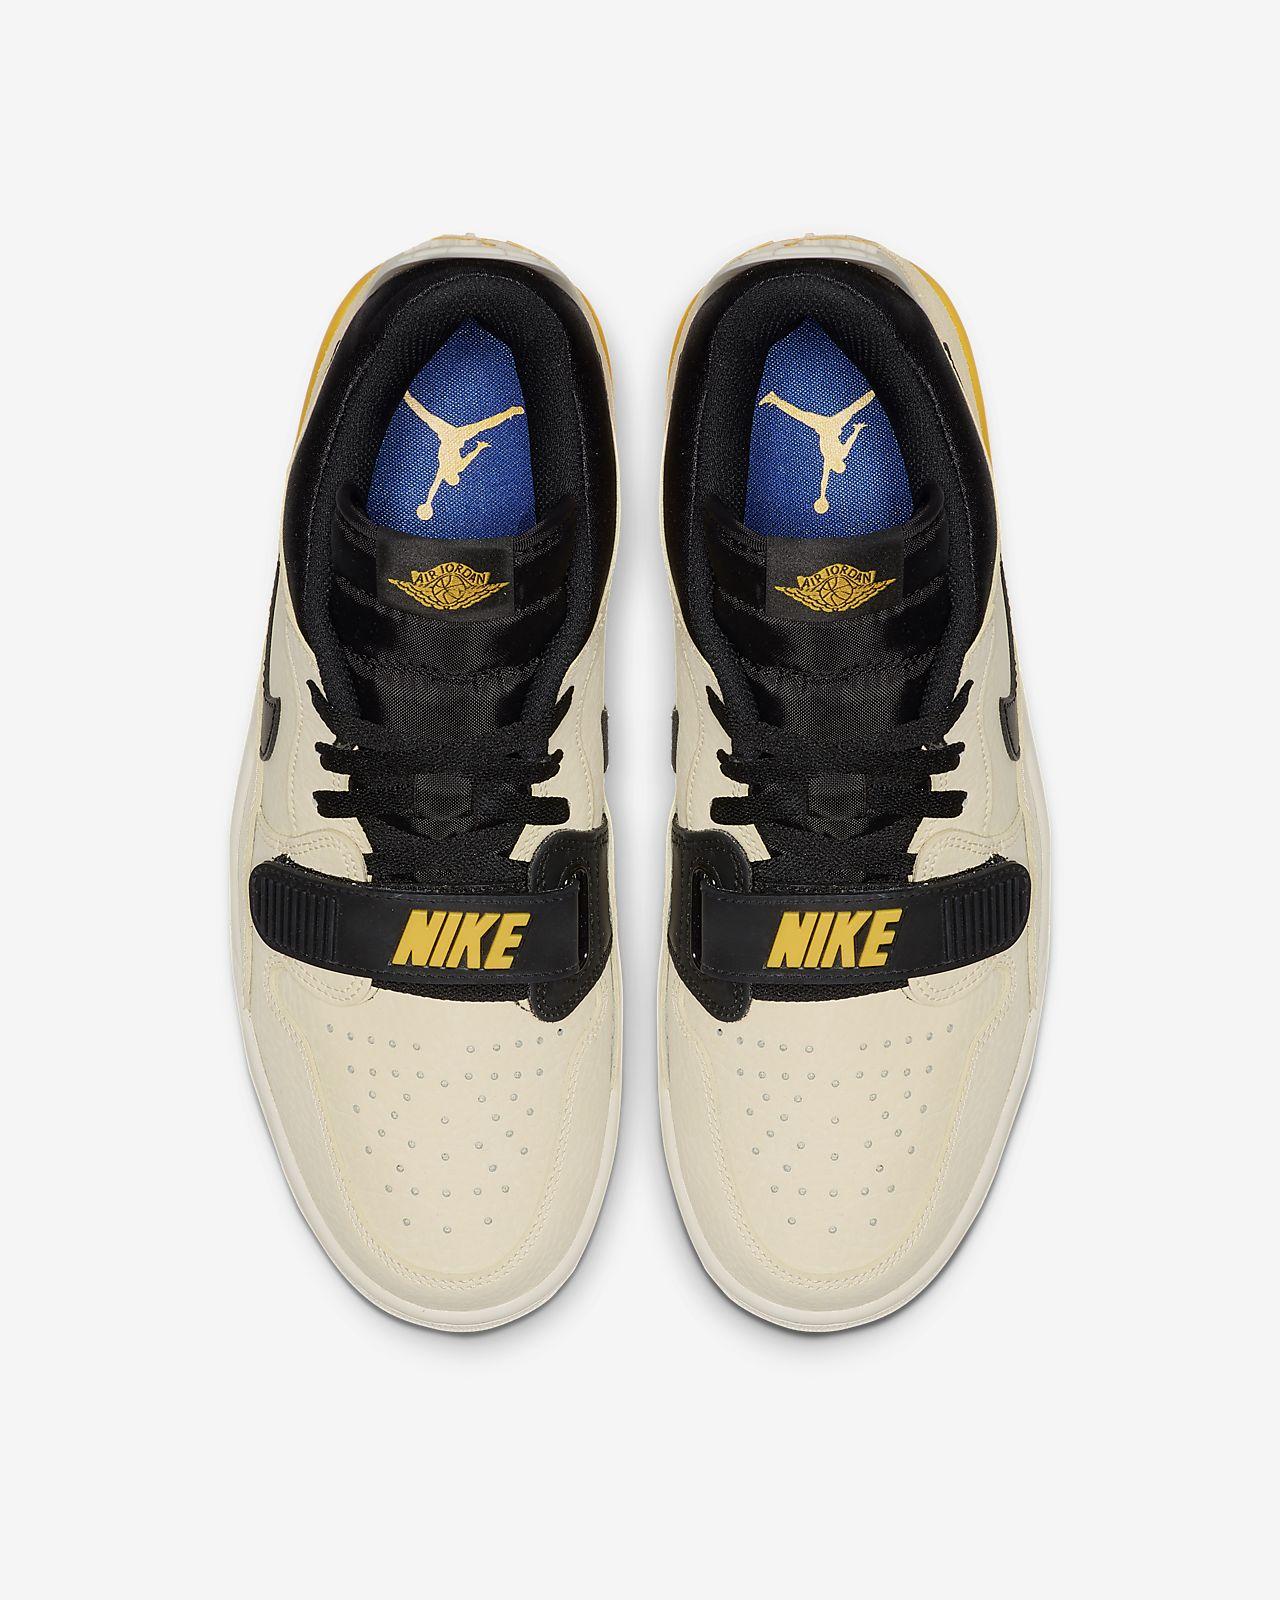 2c0637a87040 Air Jordan Legacy 312 Low Men s Shoe. Nike.com AU